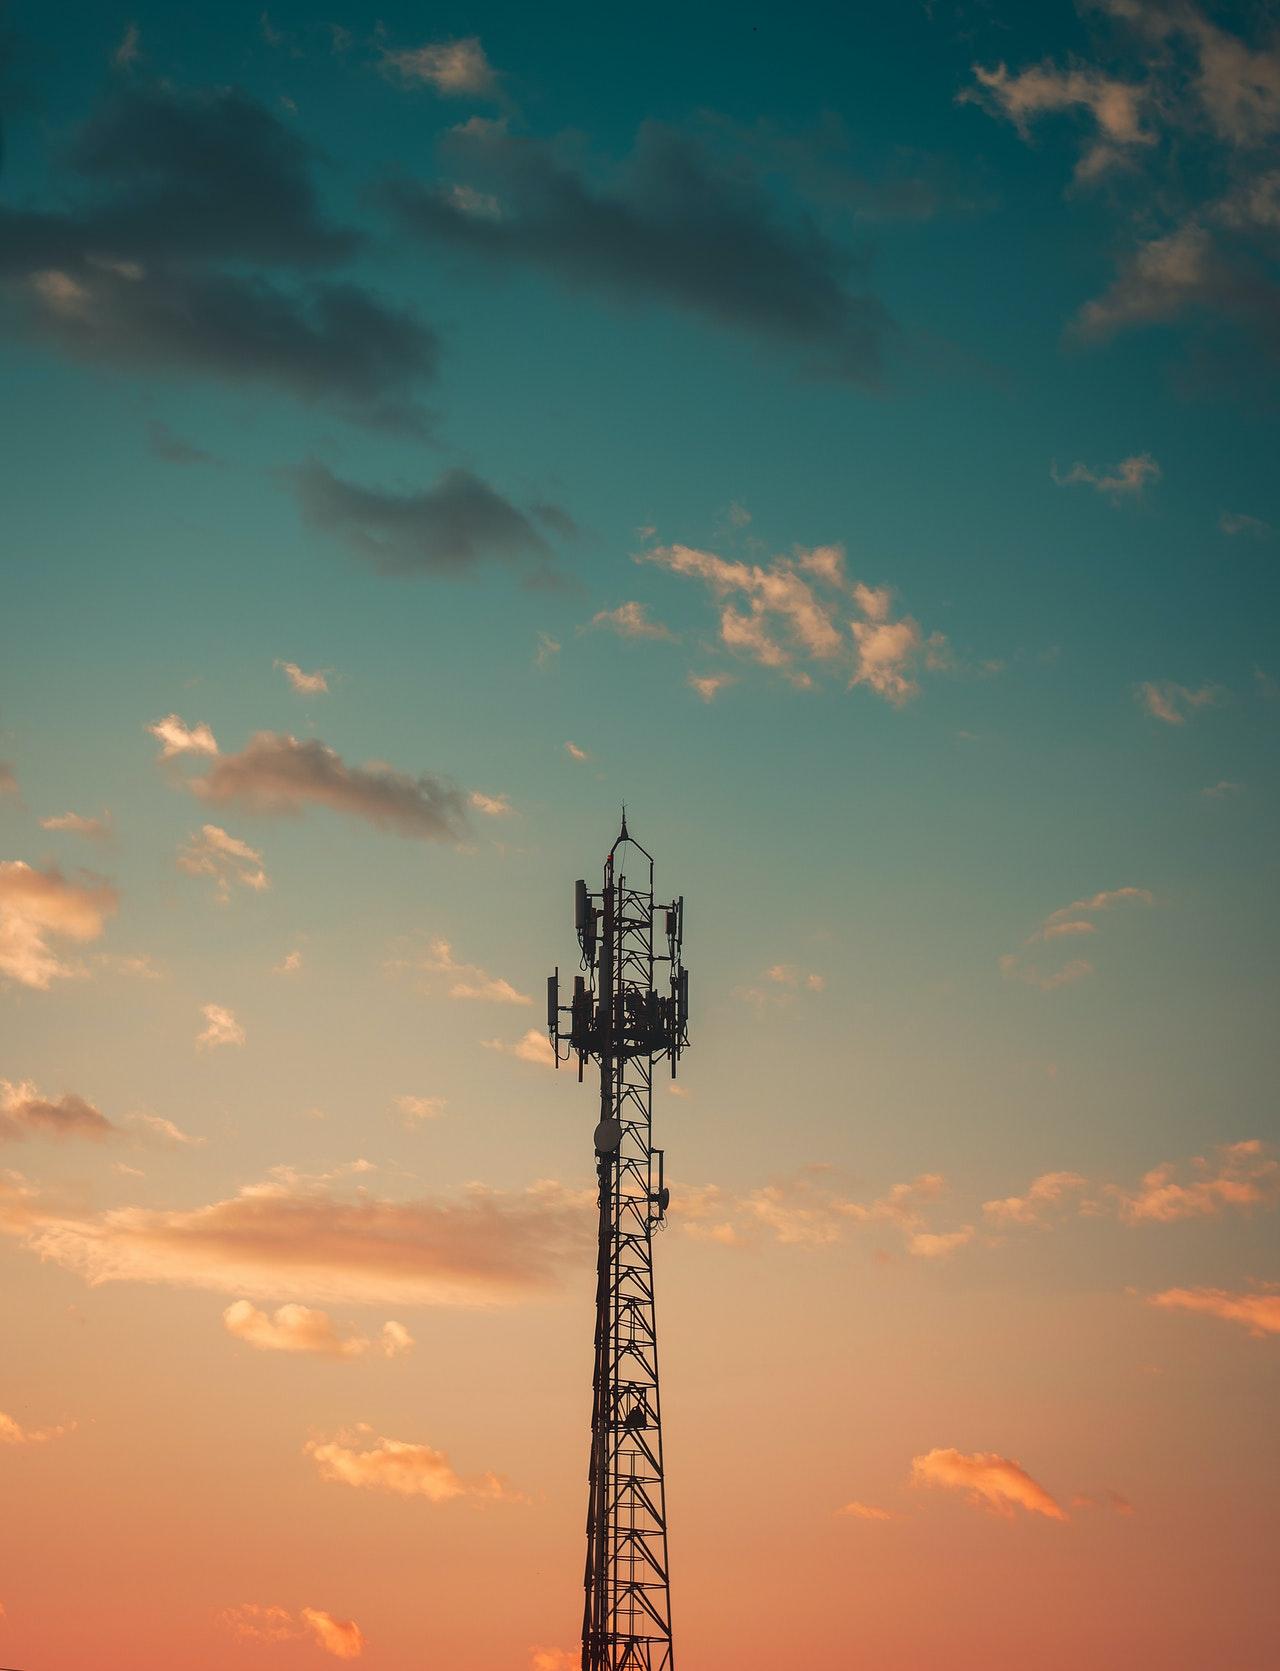 5G network station